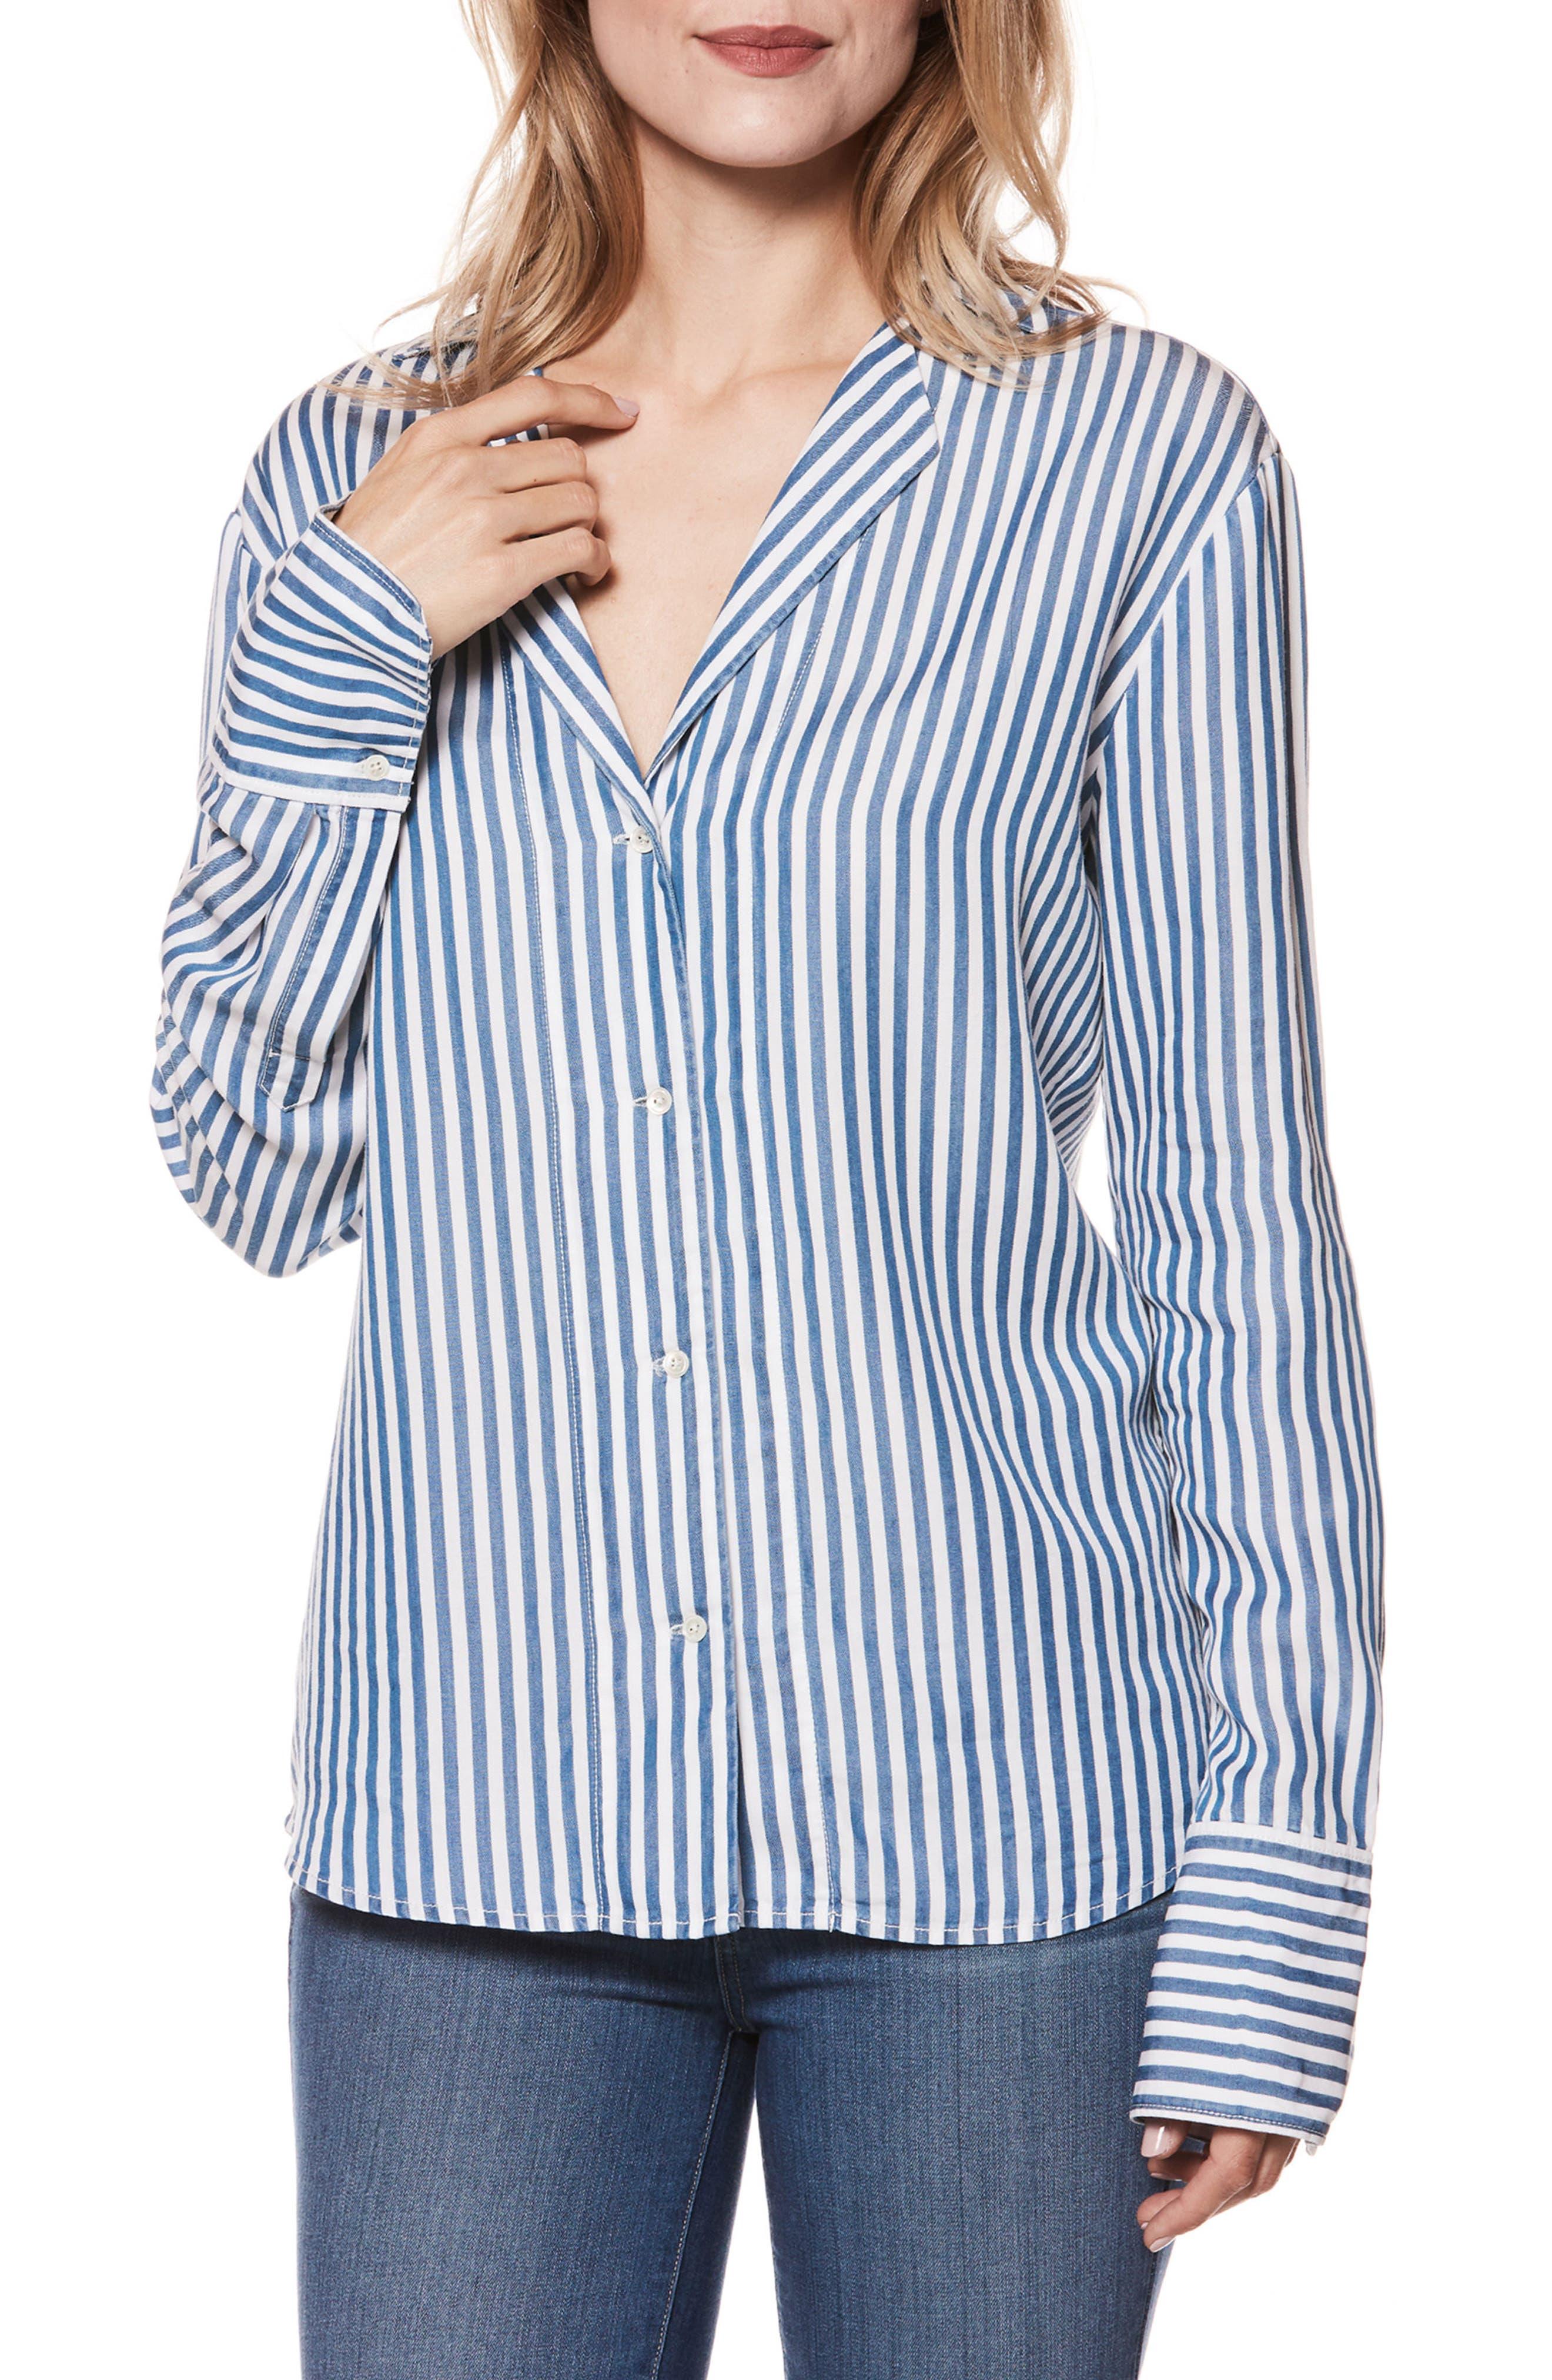 Elora Stripe Shirt,                             Main thumbnail 1, color,                             White/ Blue Bell Stripe